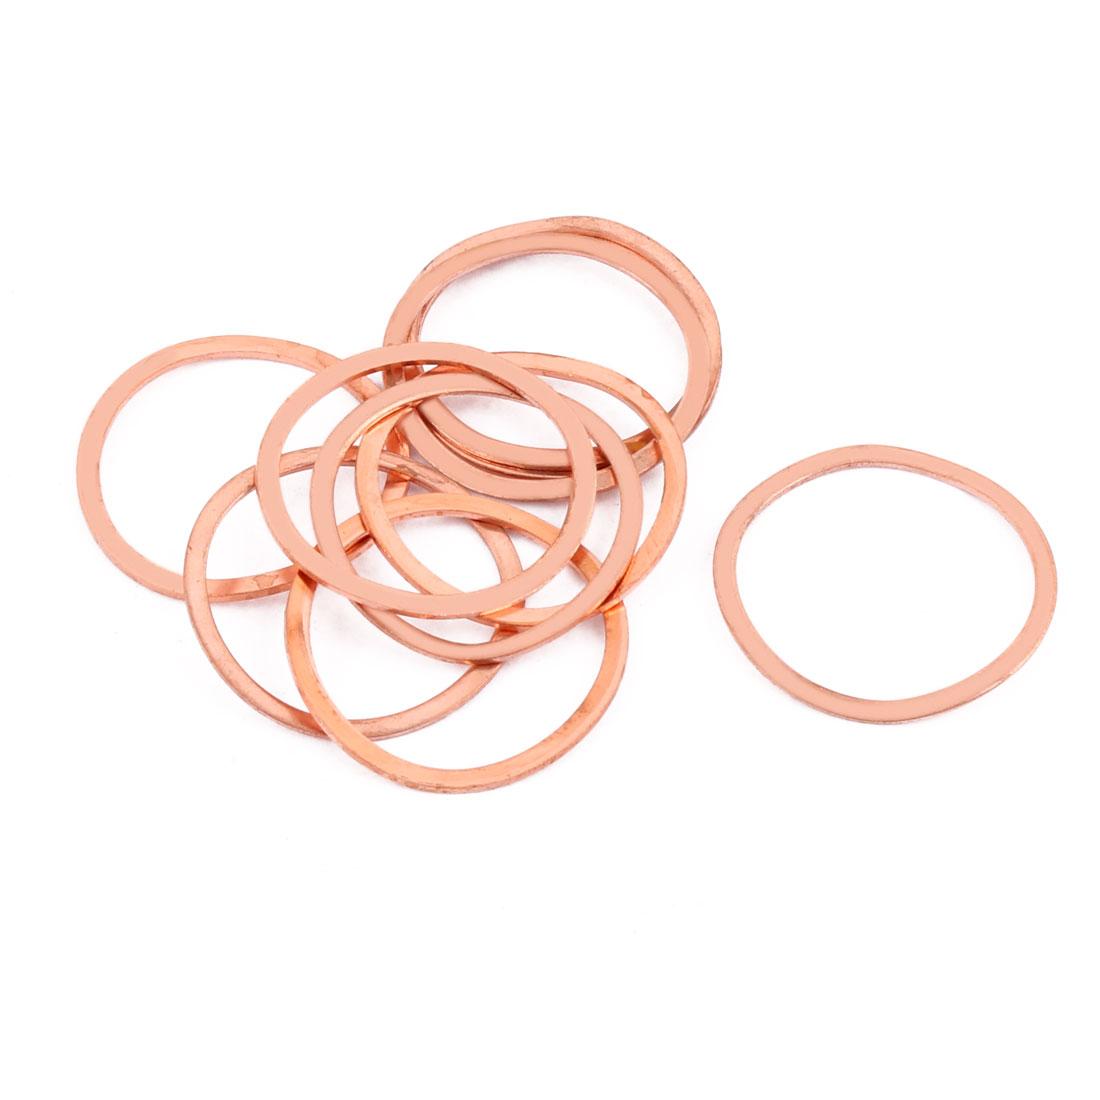 10pcs 32mm x 27mm x 1mm Flat Ring Copper Crush Washer Sealing Gasket Fastener